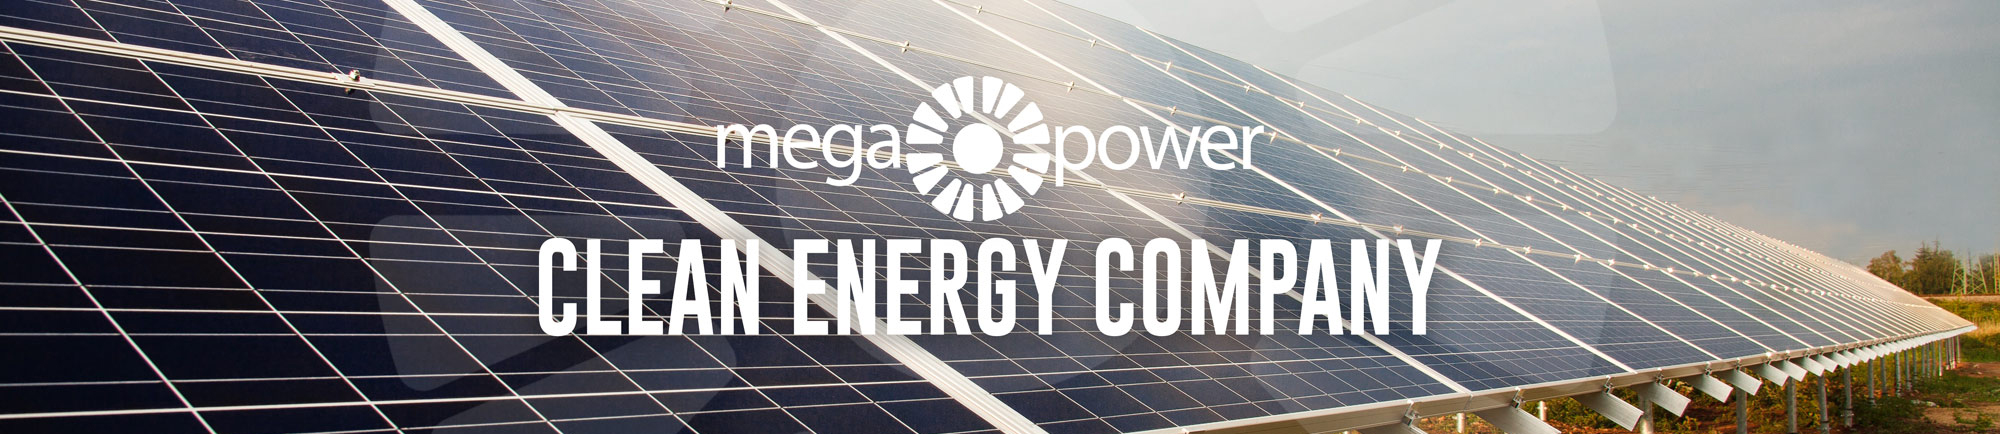 megasunpower-solar-company.jpg